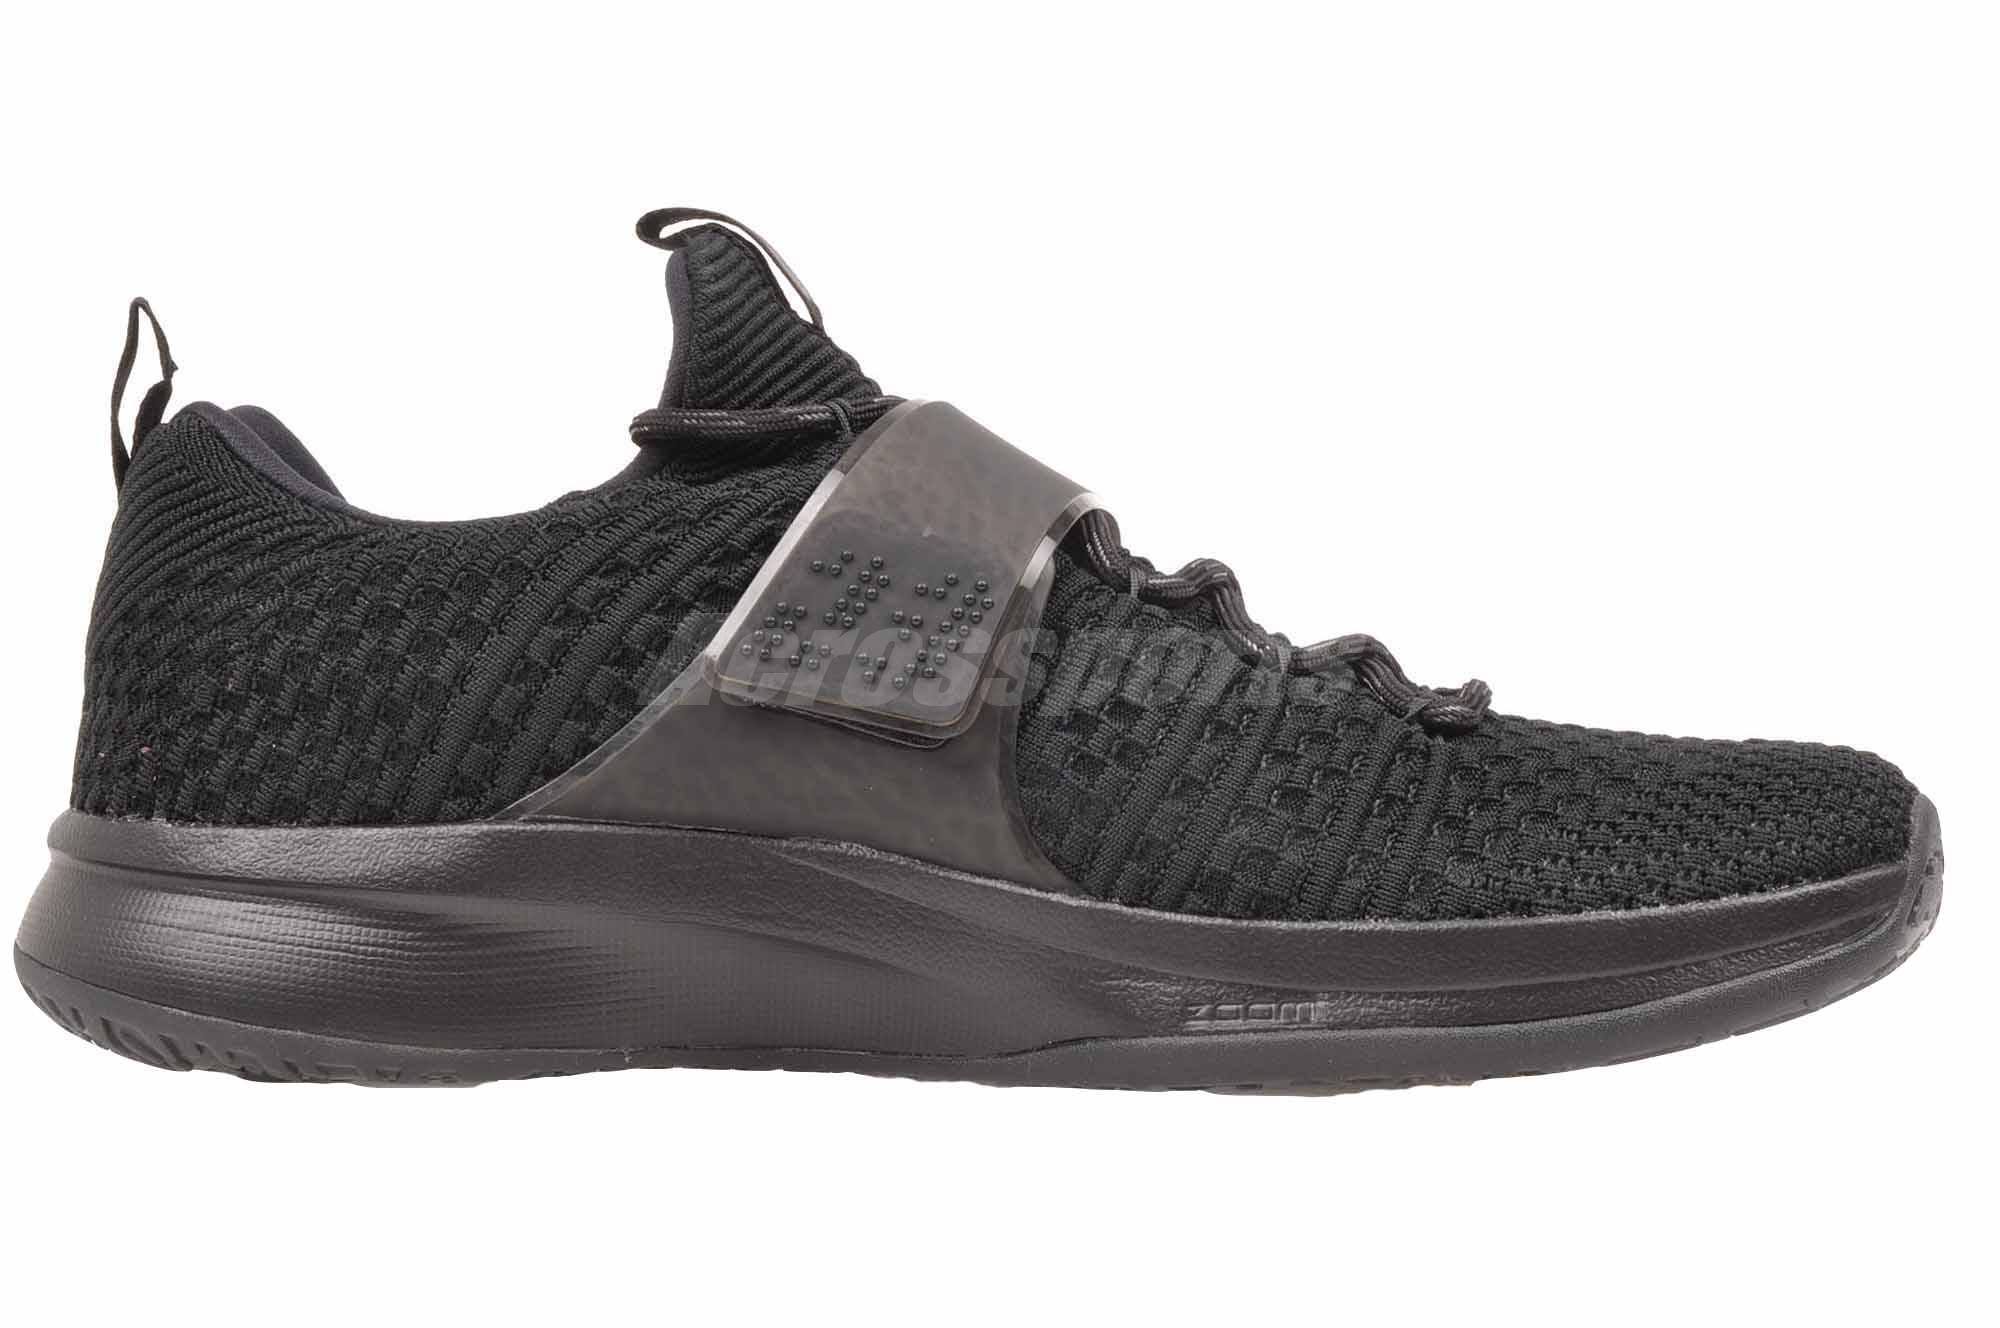 11311af7fc6 Nike Jordan Trainer 2 Flyknit Cross Training Mens Shoes Air Black ...